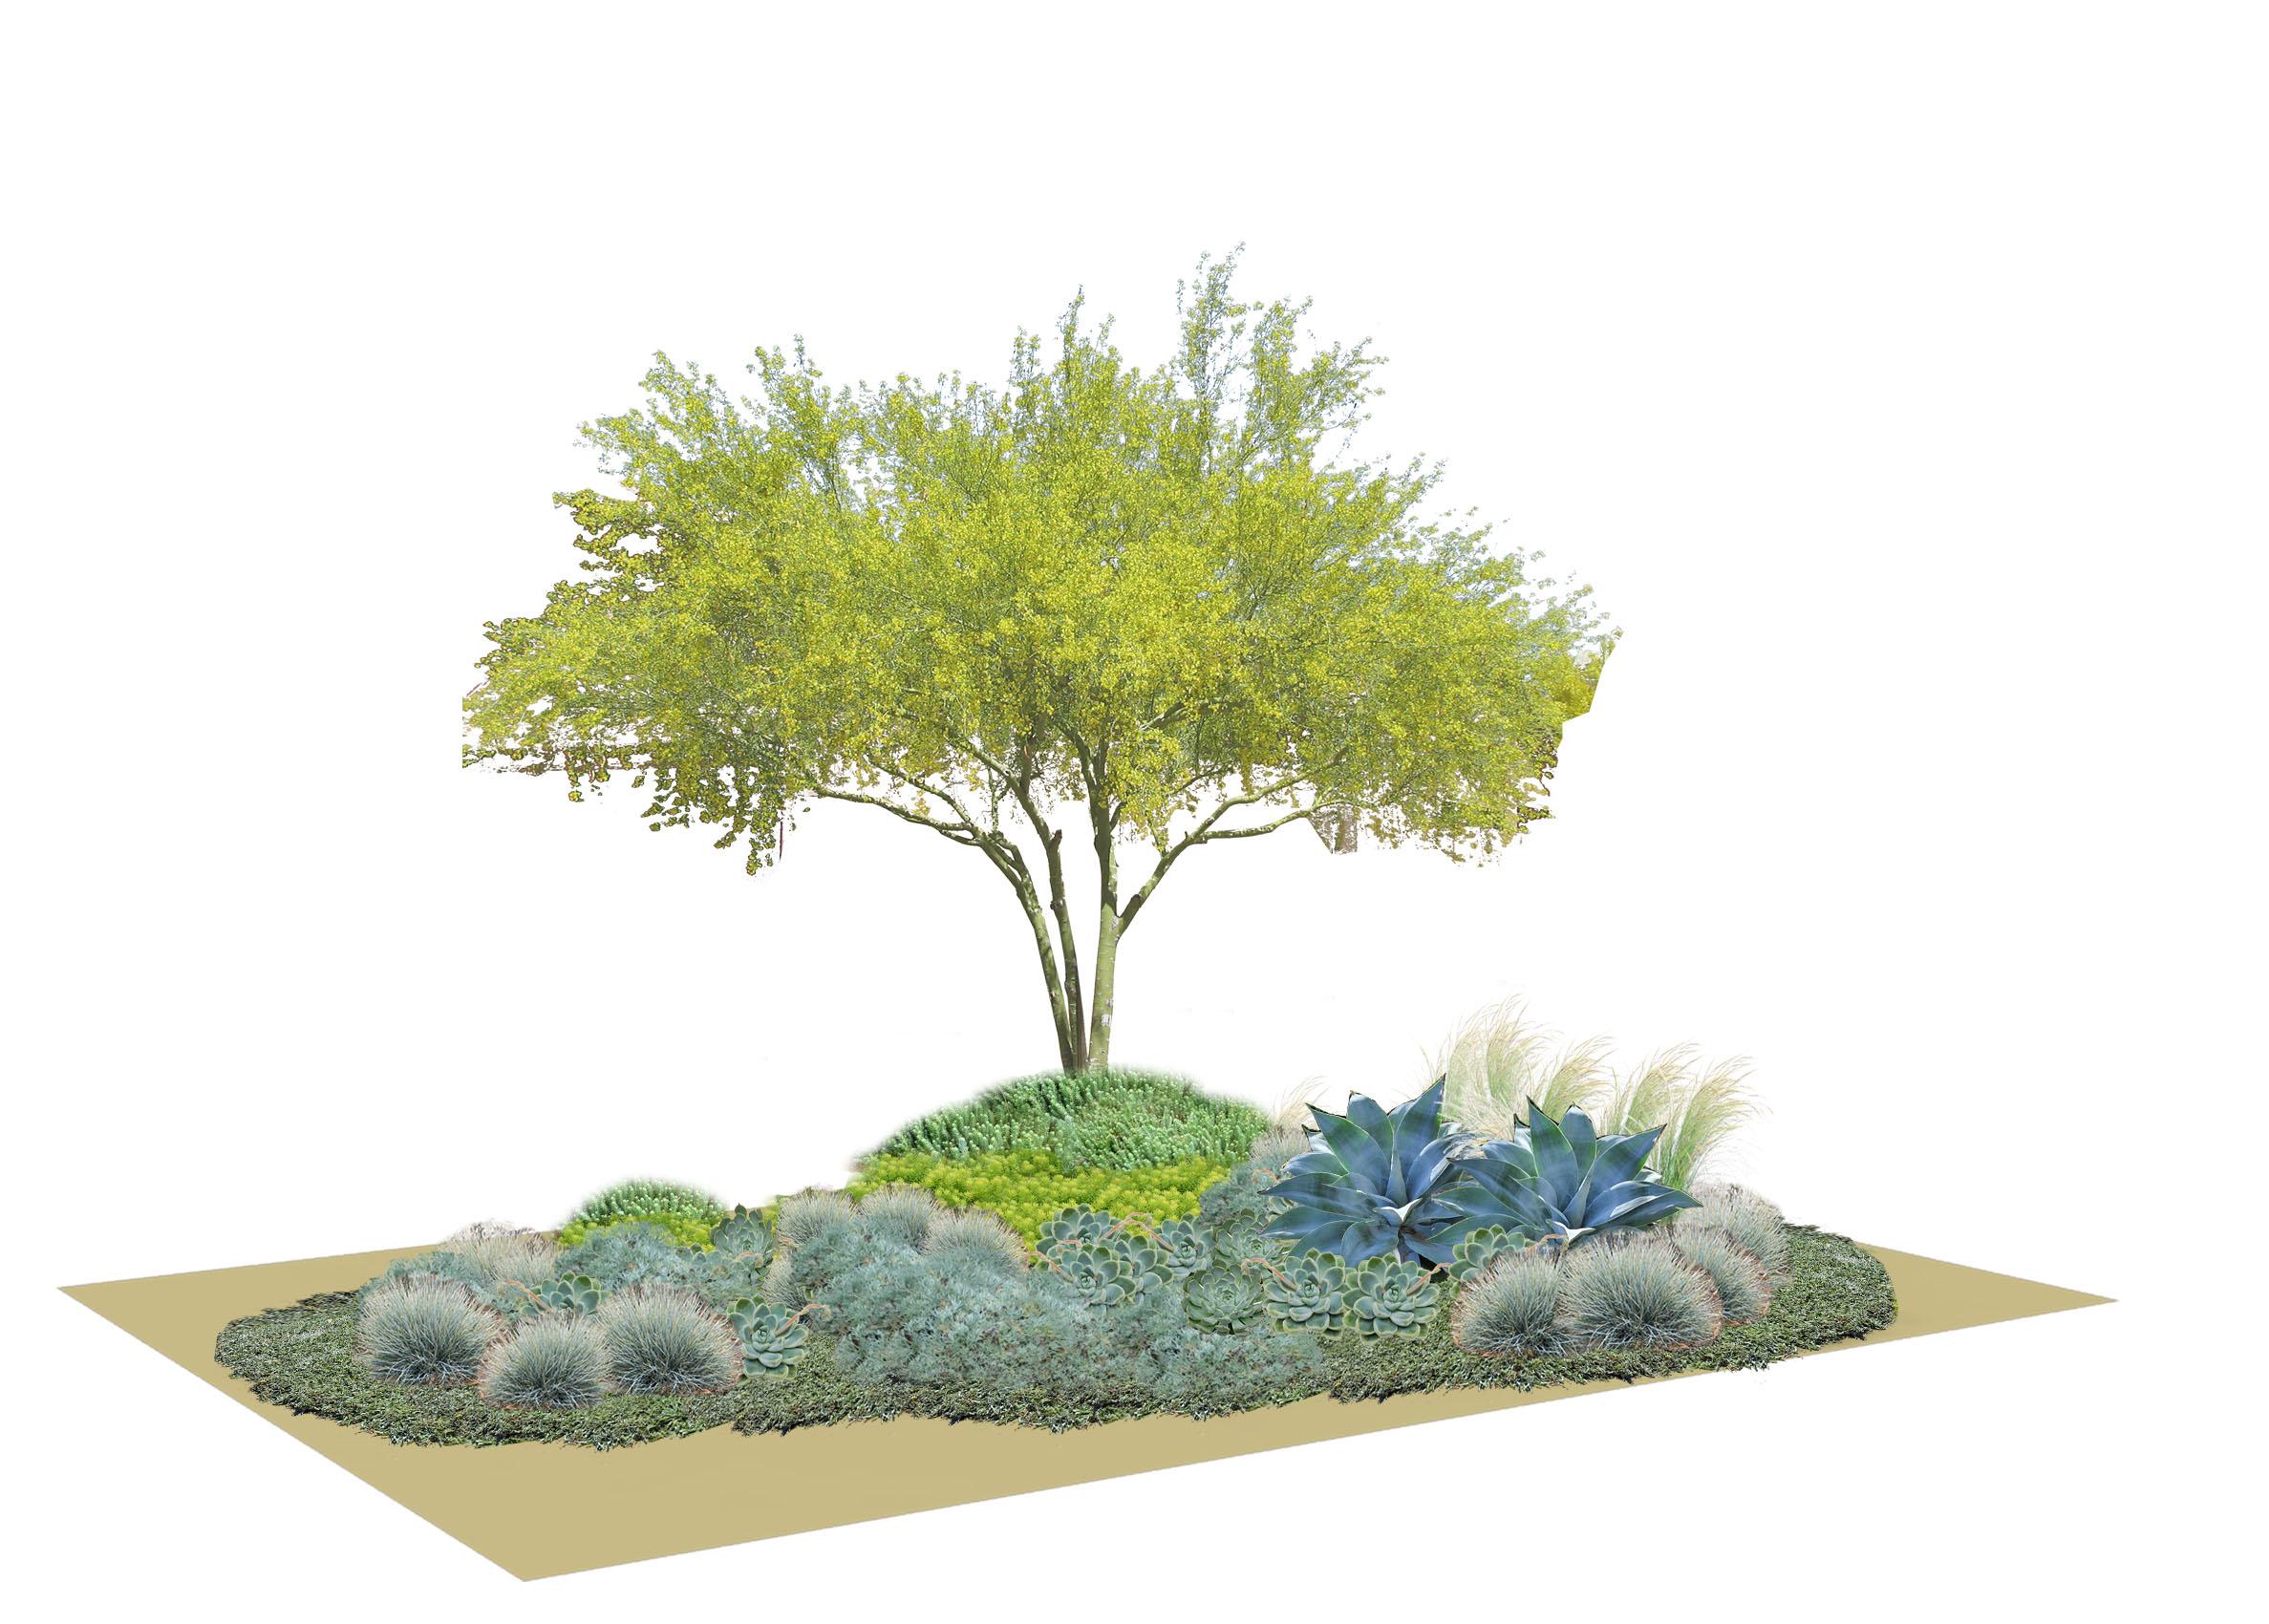 Dry 1.3 Planting Scheme .jpg